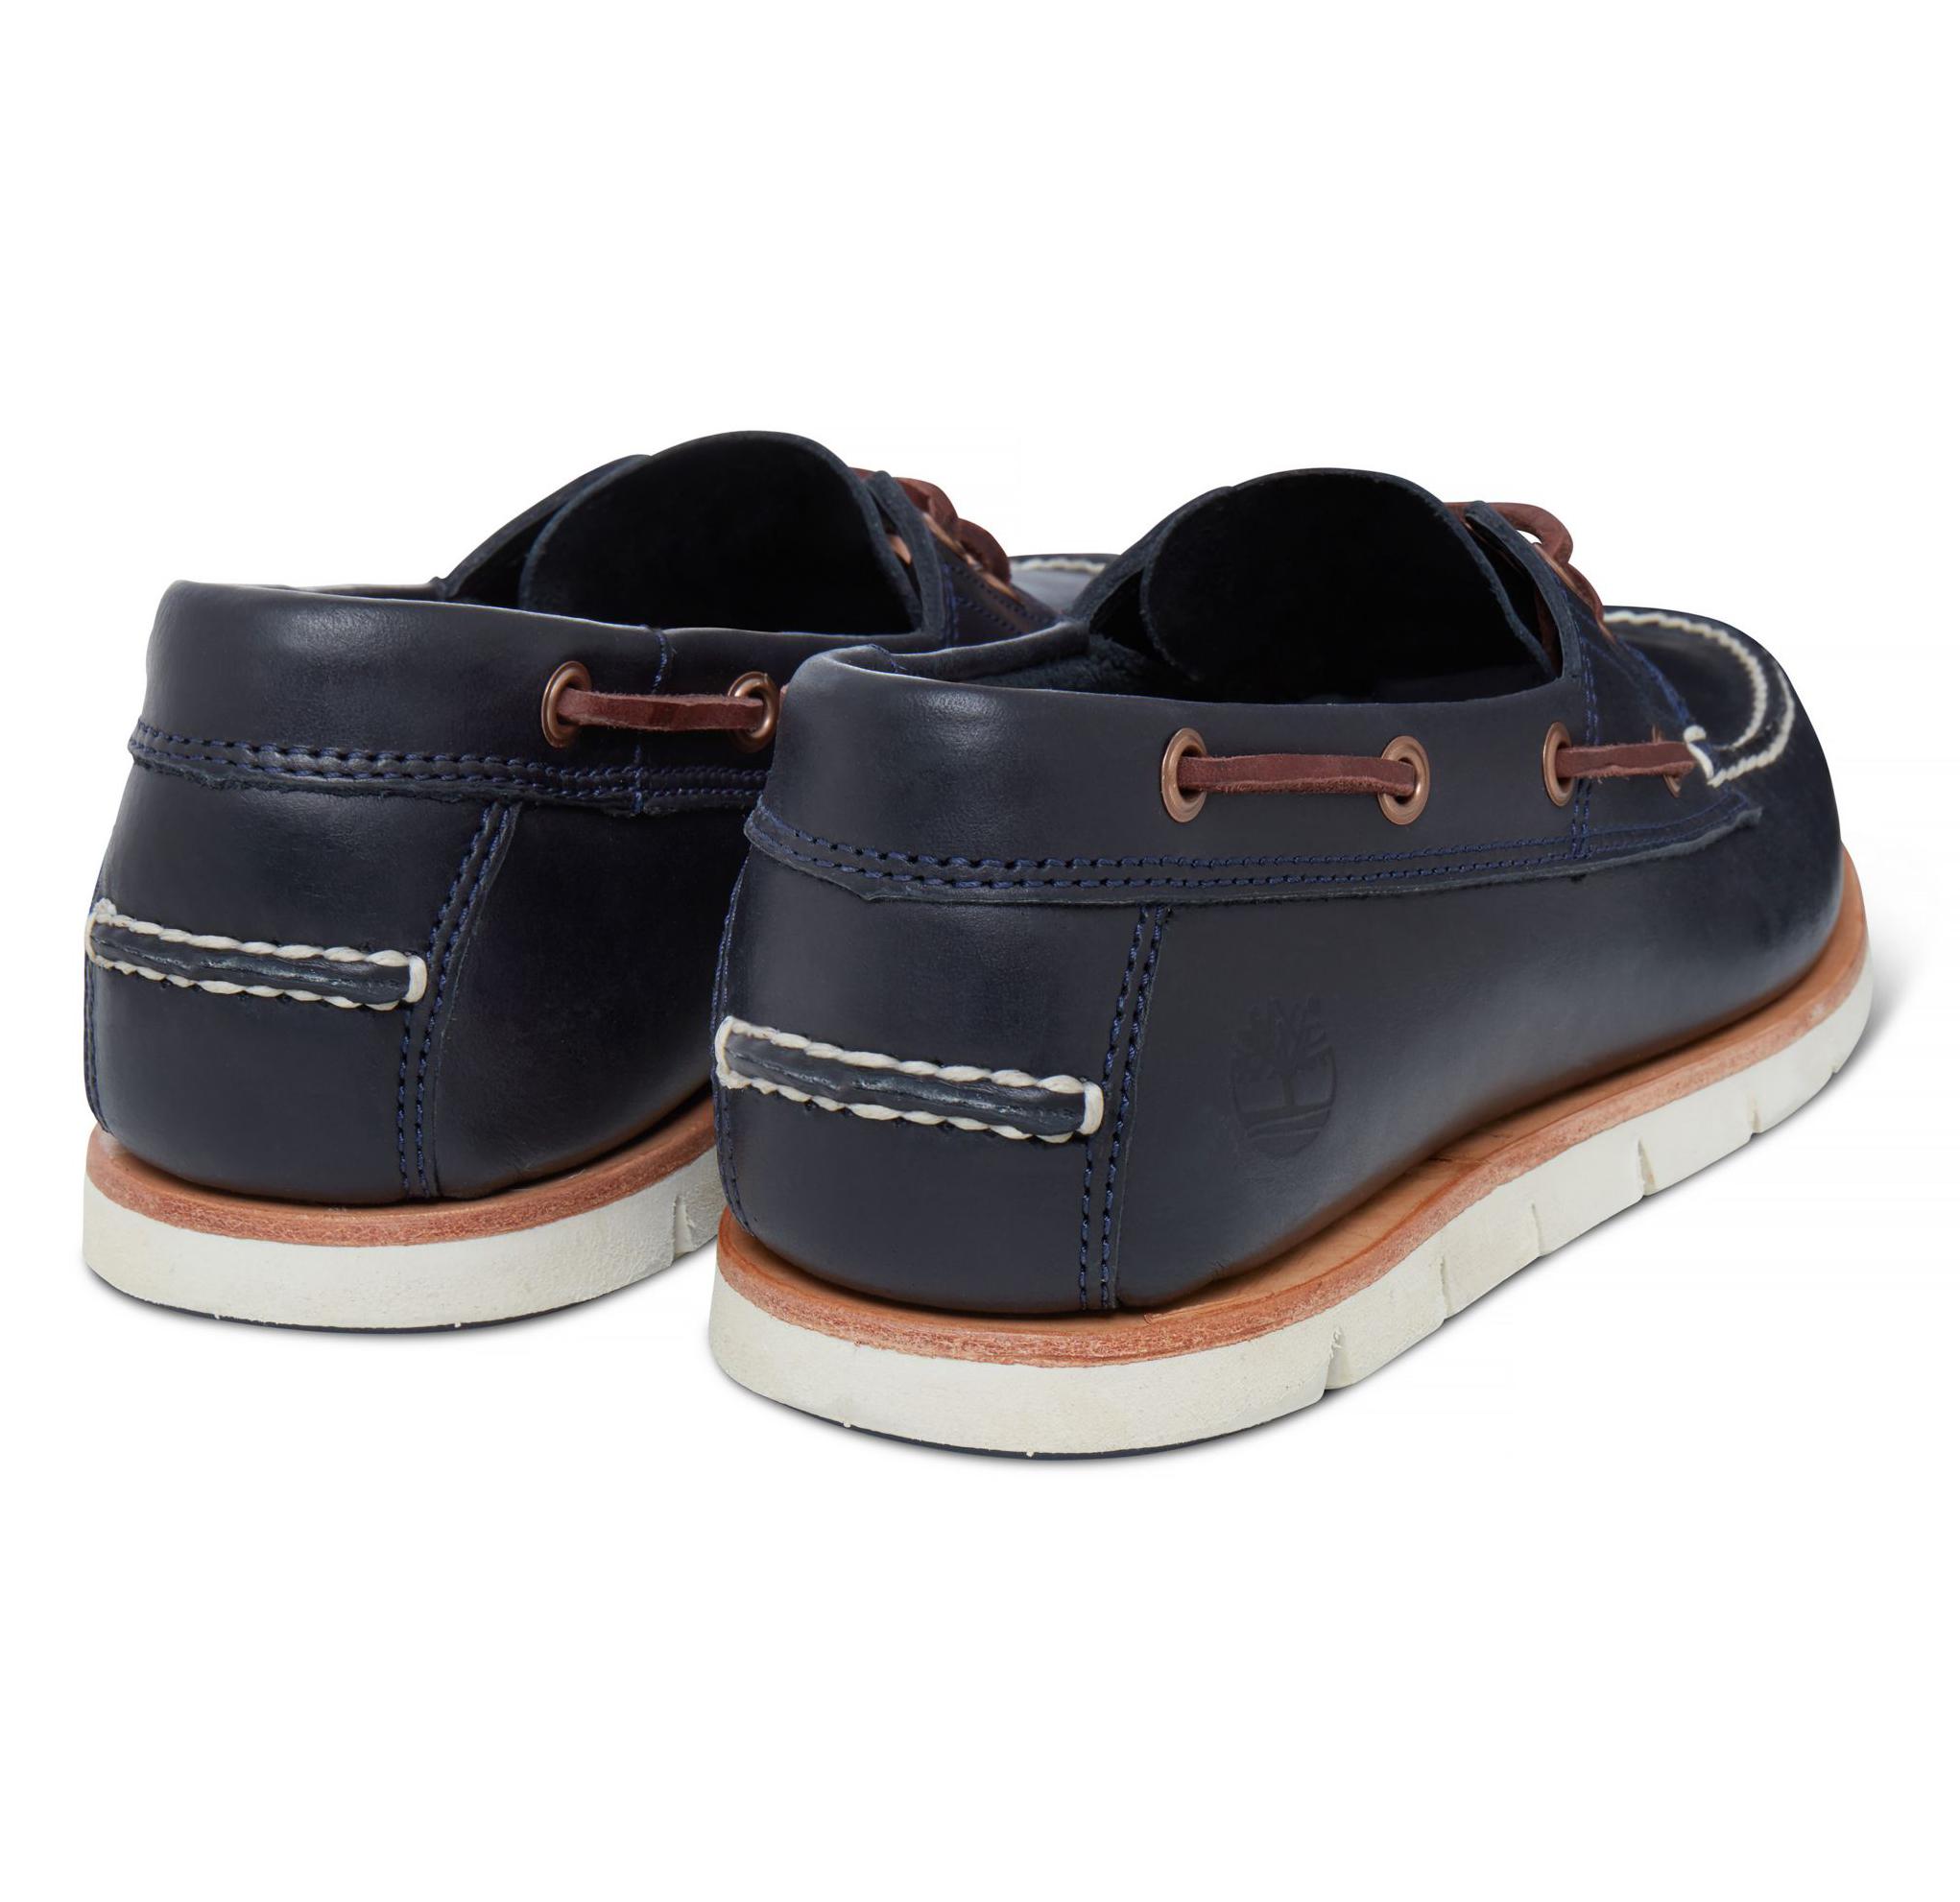 Détails sur Timberland Tidelands 2 Eye Chaussures Bateau Cuir Pont Chaussure Bleu Indigo